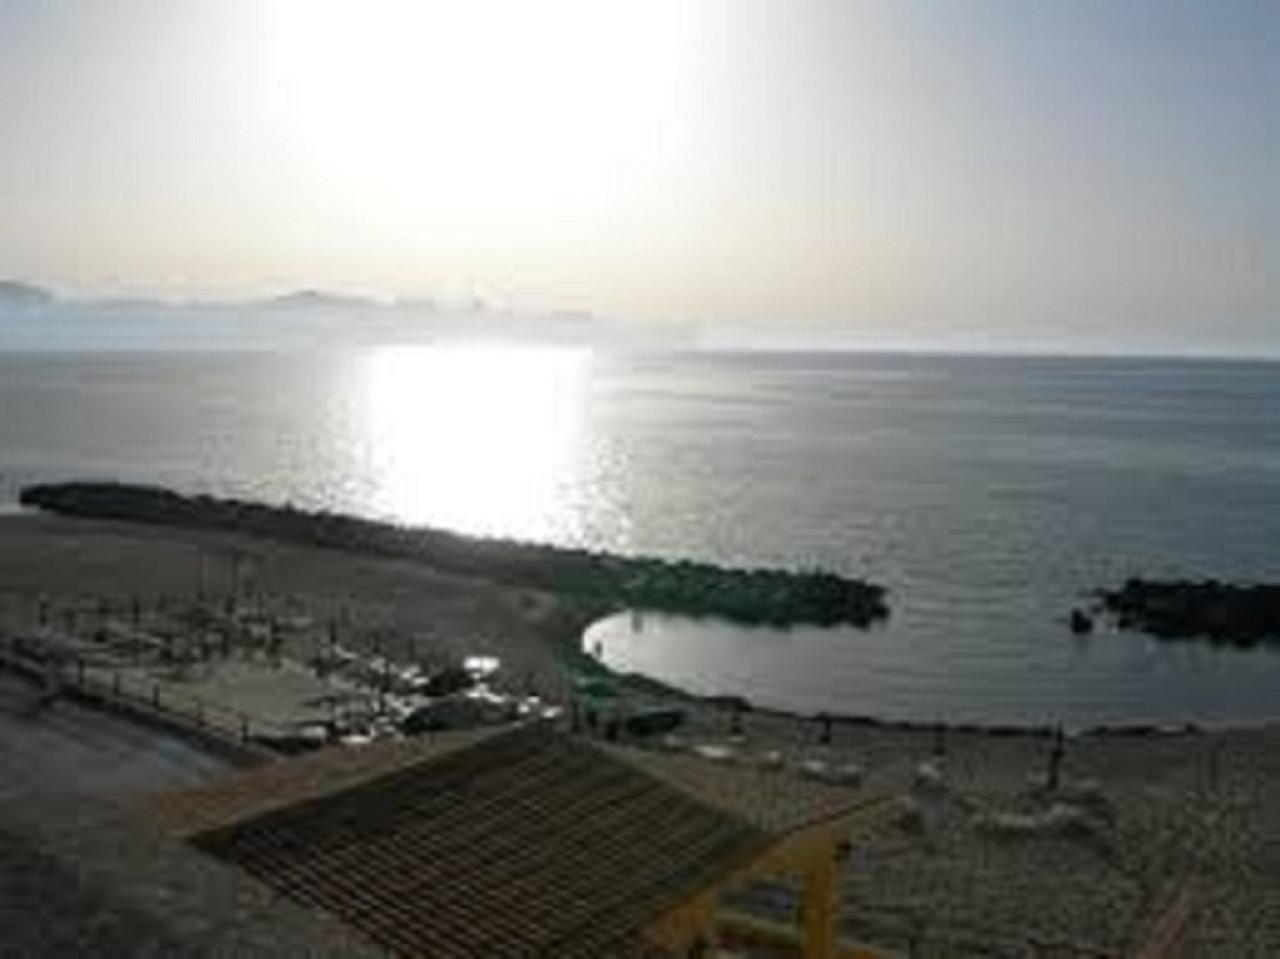 Appartement de vacances casa vacanza alba (642168), Trappeto, Palermo, Sicile, Italie, image 21